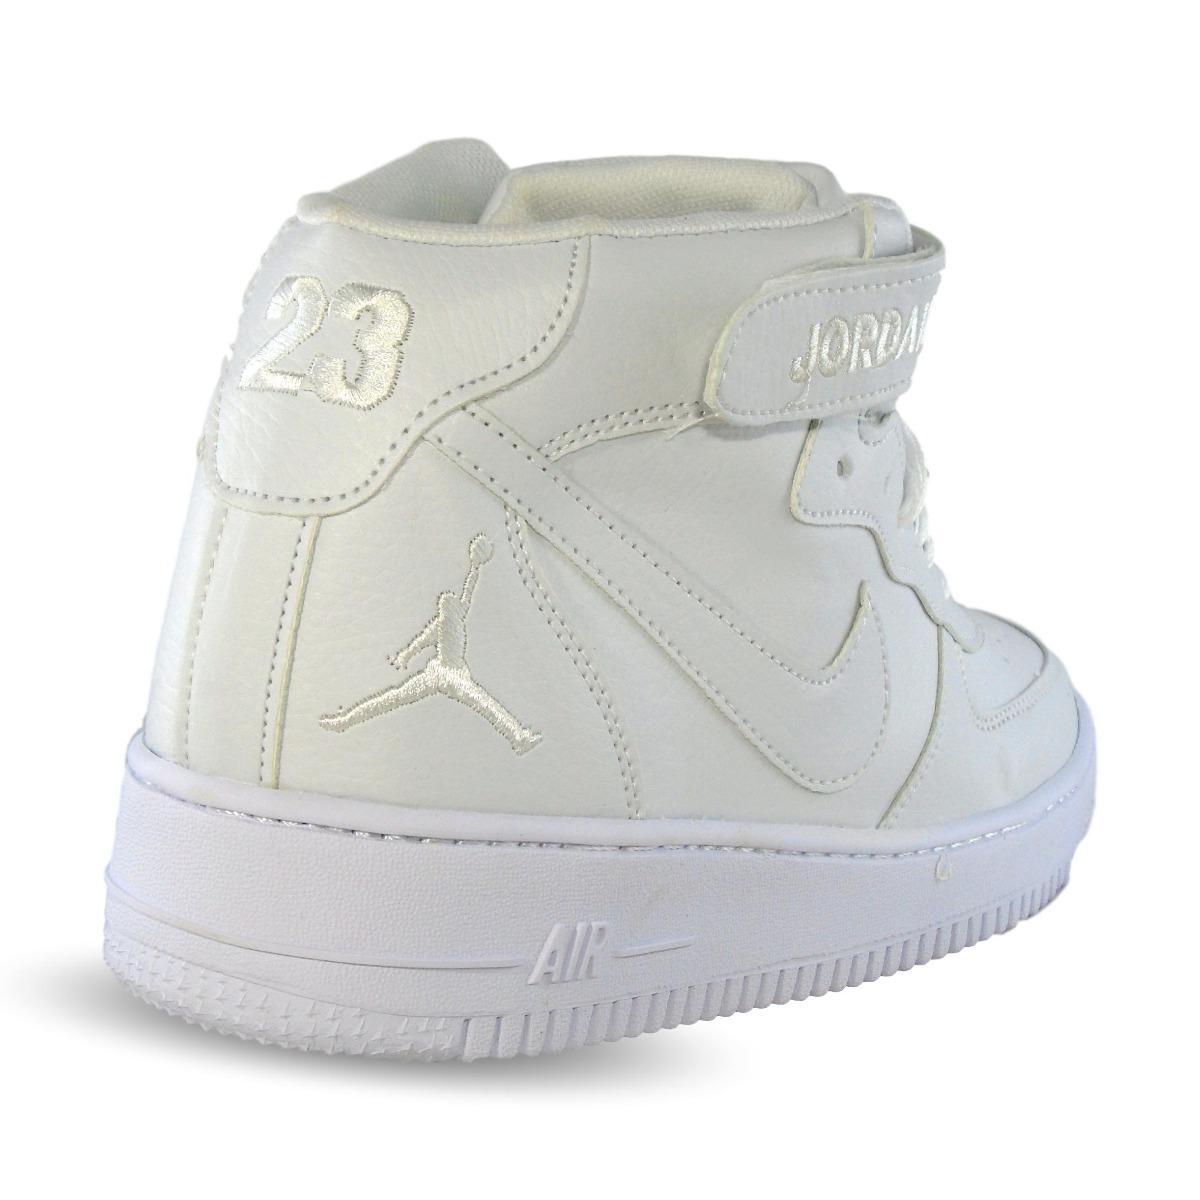 real nike jordan air force 1 todas blanco 601d1 7e134